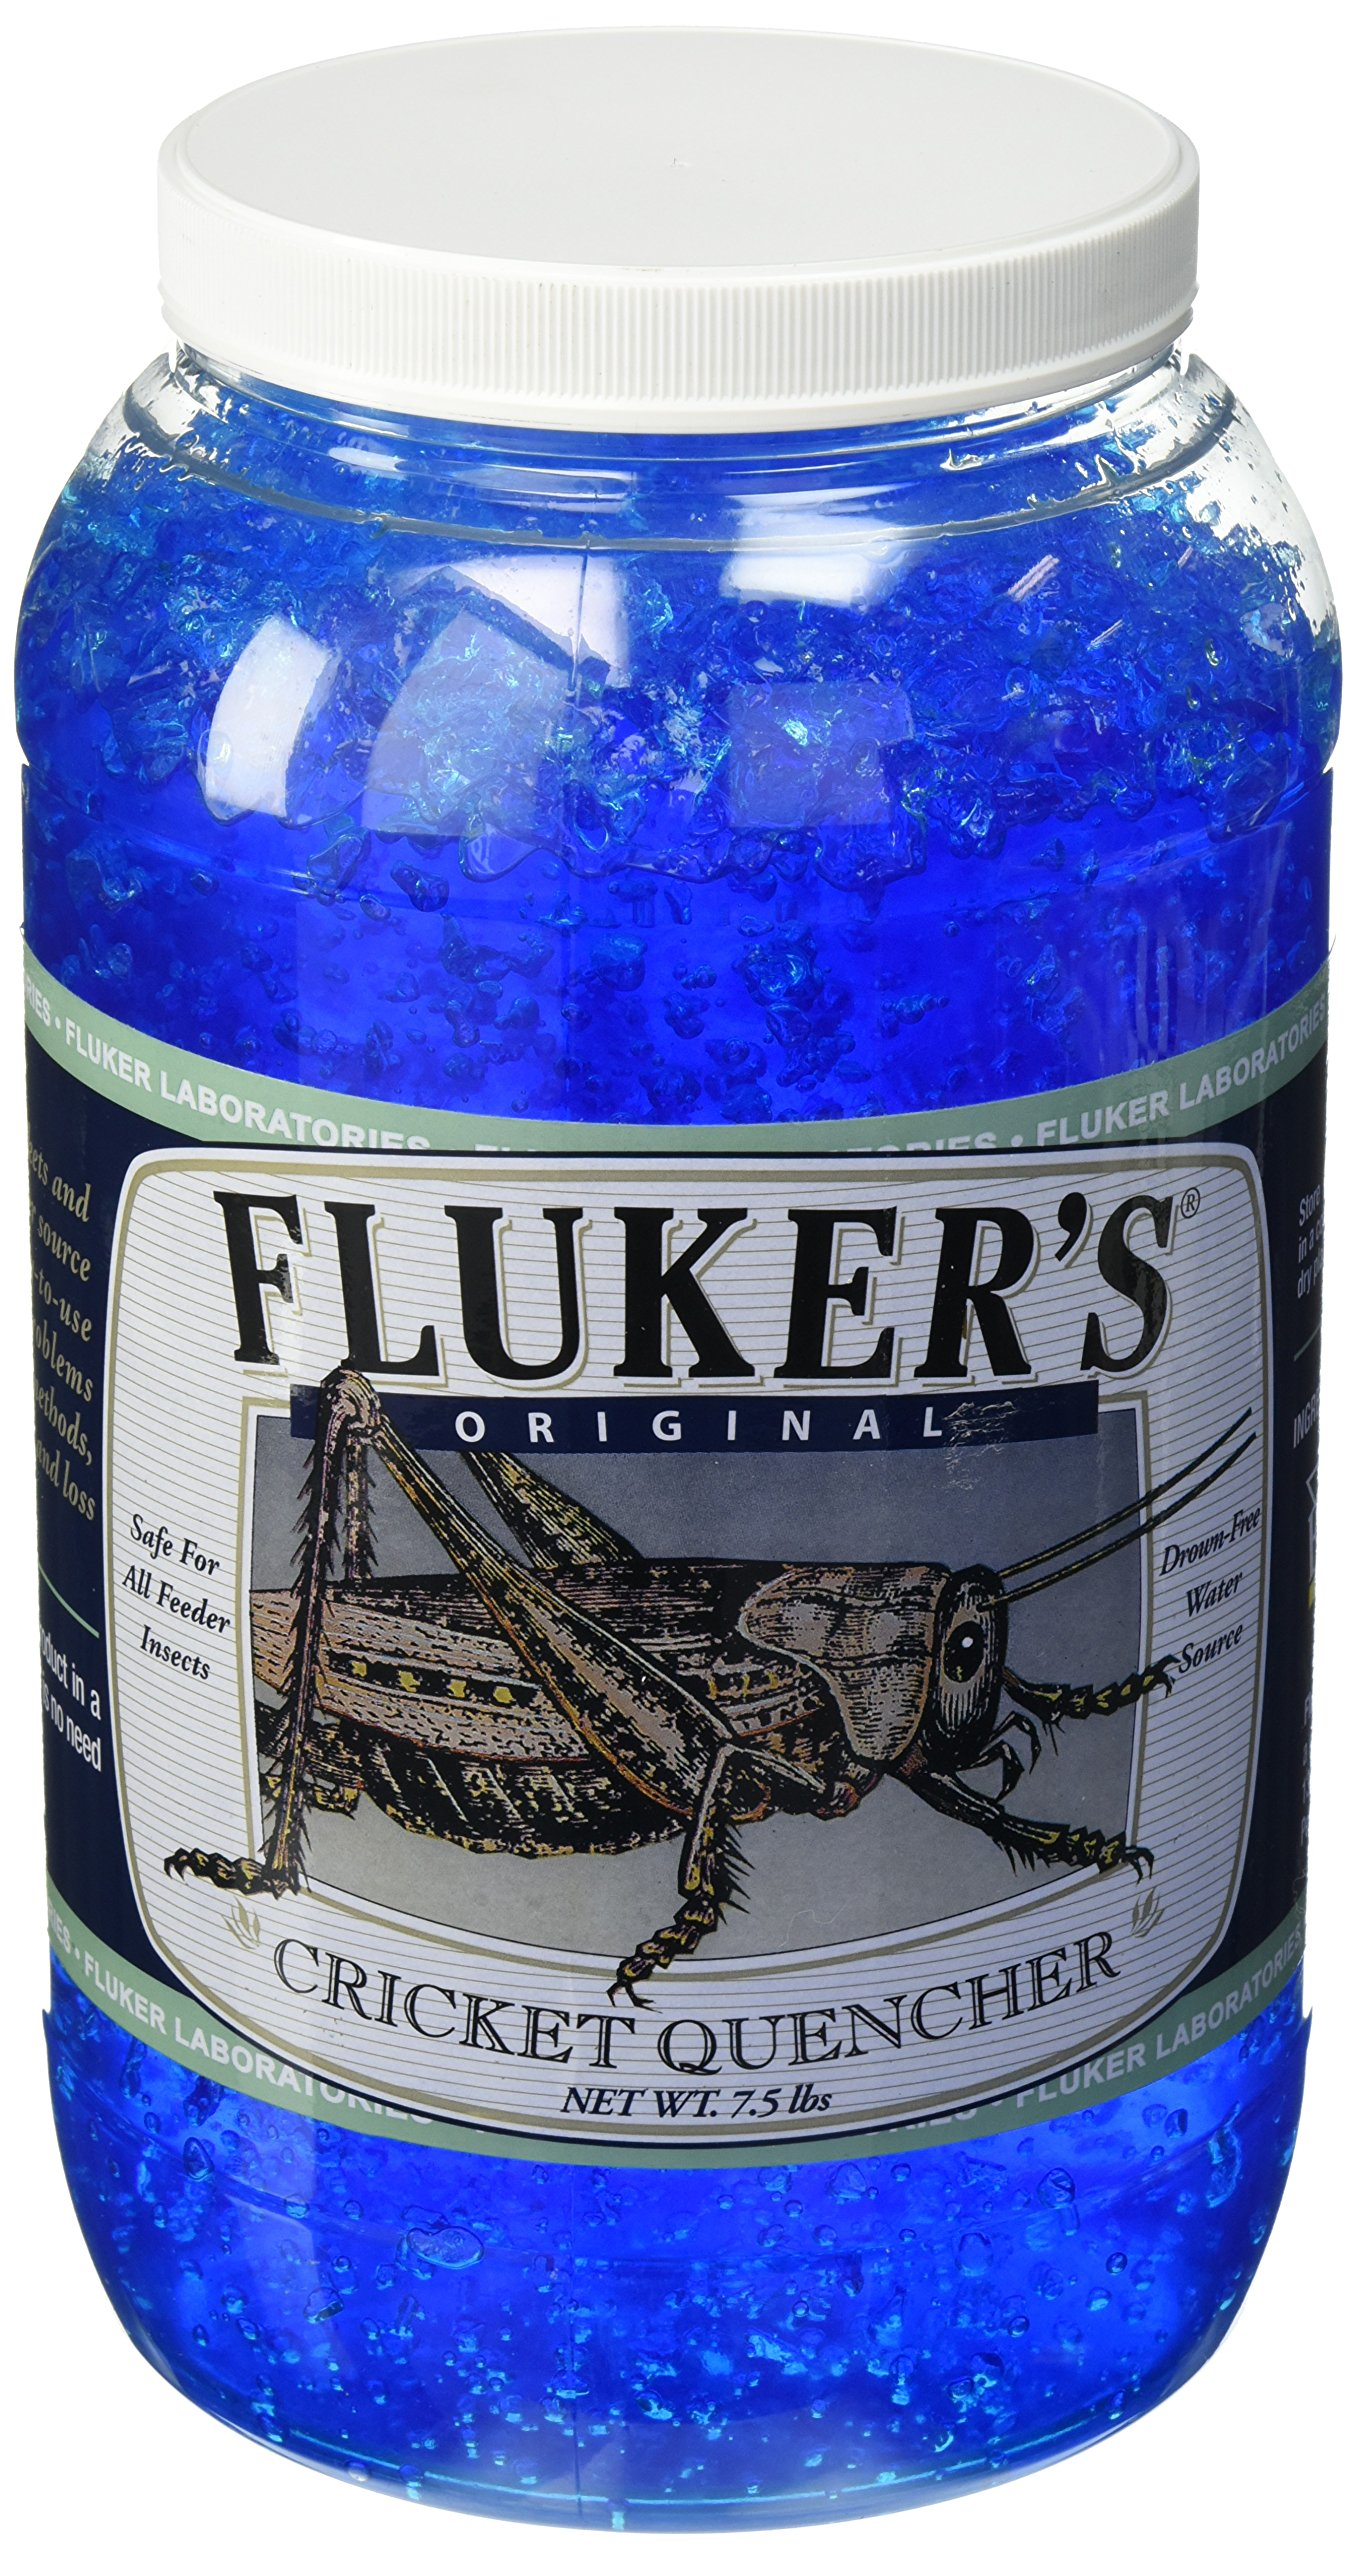 Fluker Labs SFK71202 Original formula Cricket Quencher, 7.5-Pound